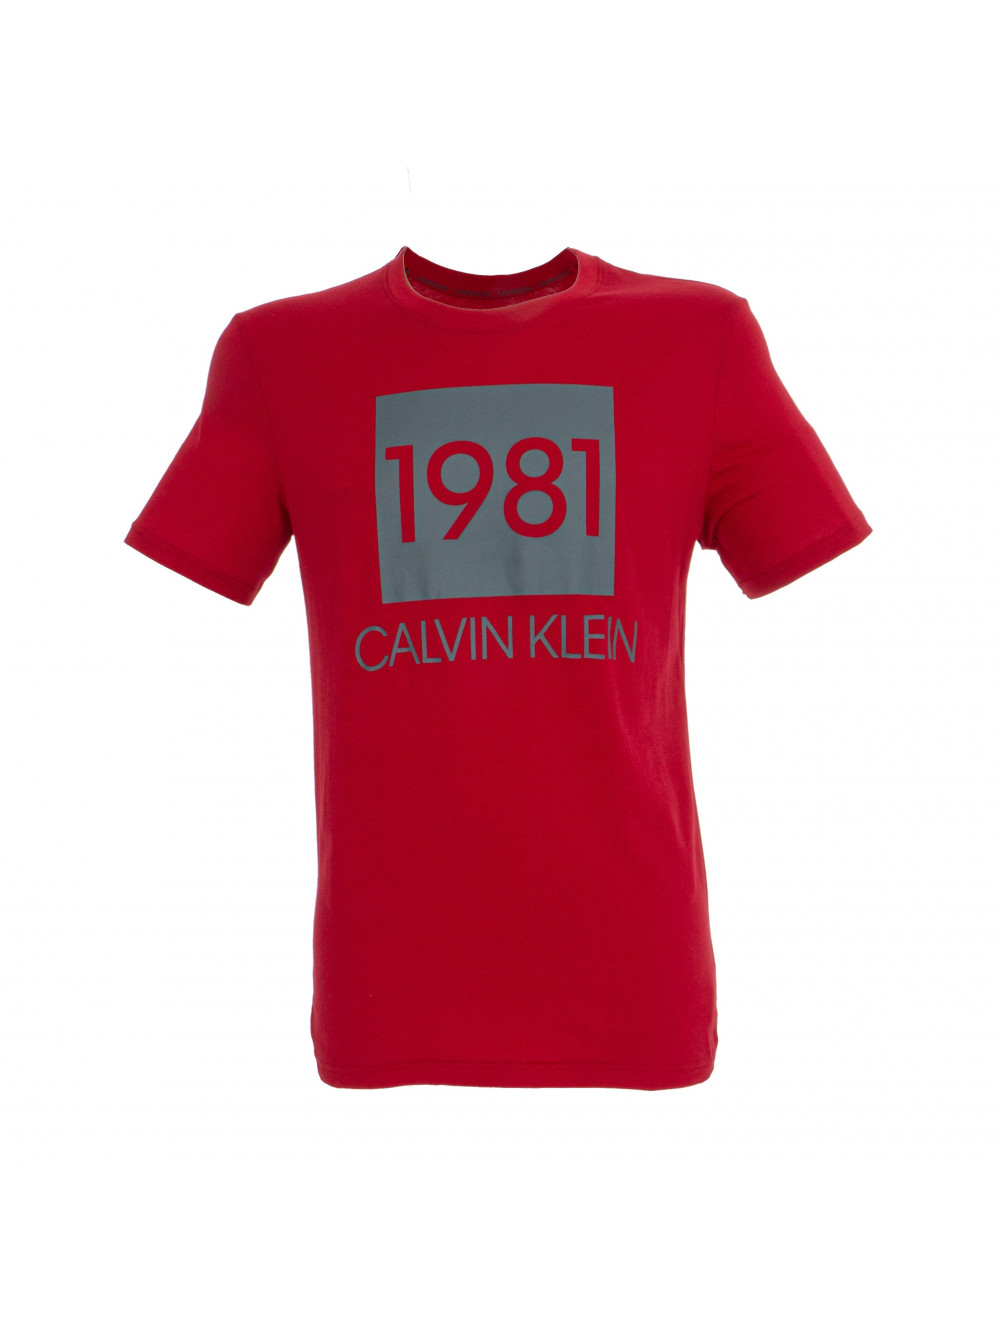 Férfi póló Calvin Klein SS Crew Neck 1981 piros